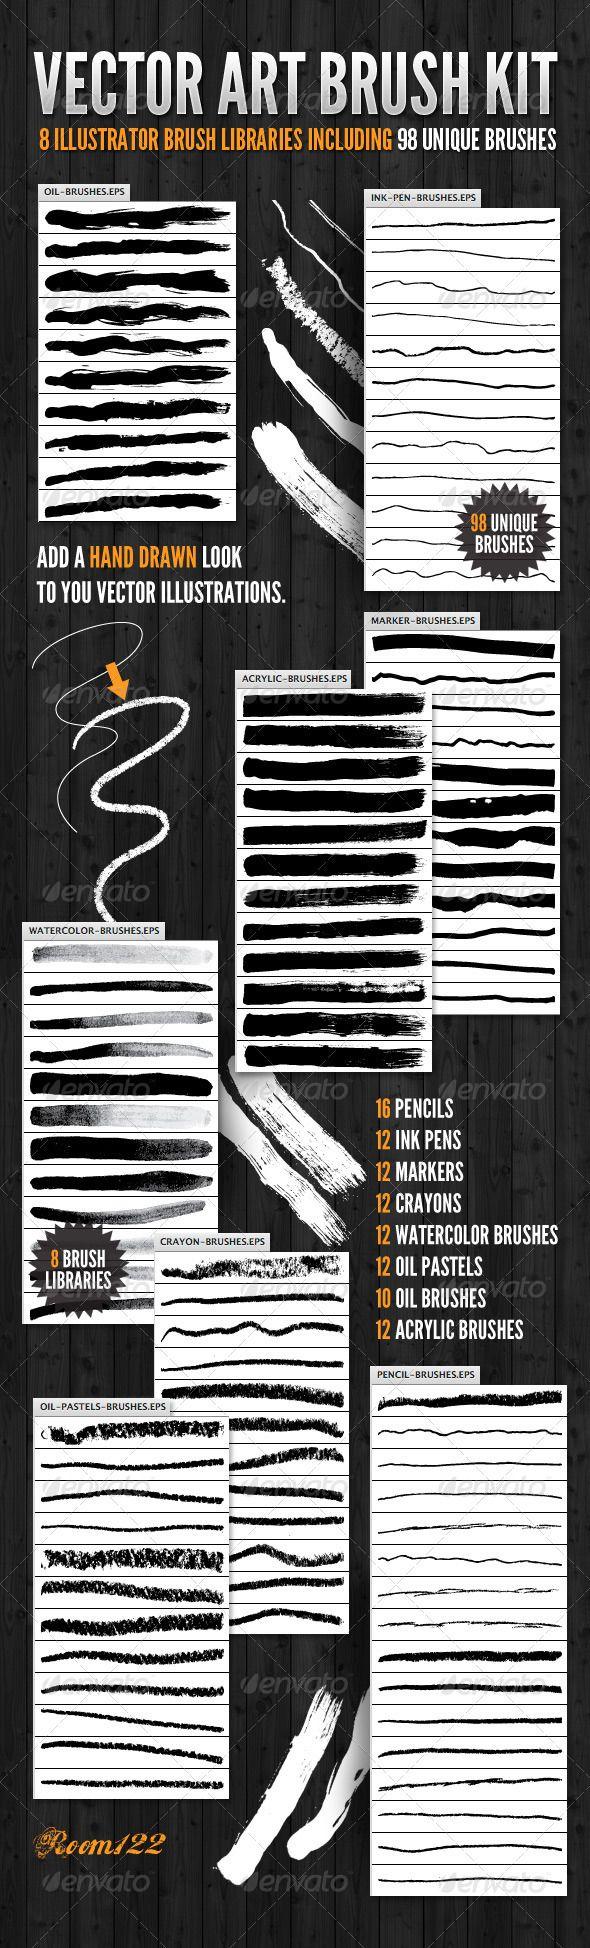 Watercolor art history brush - Best 25 Artist Brush Ideas On Pinterest Oleo Painting Styling Brush And Photo Brush